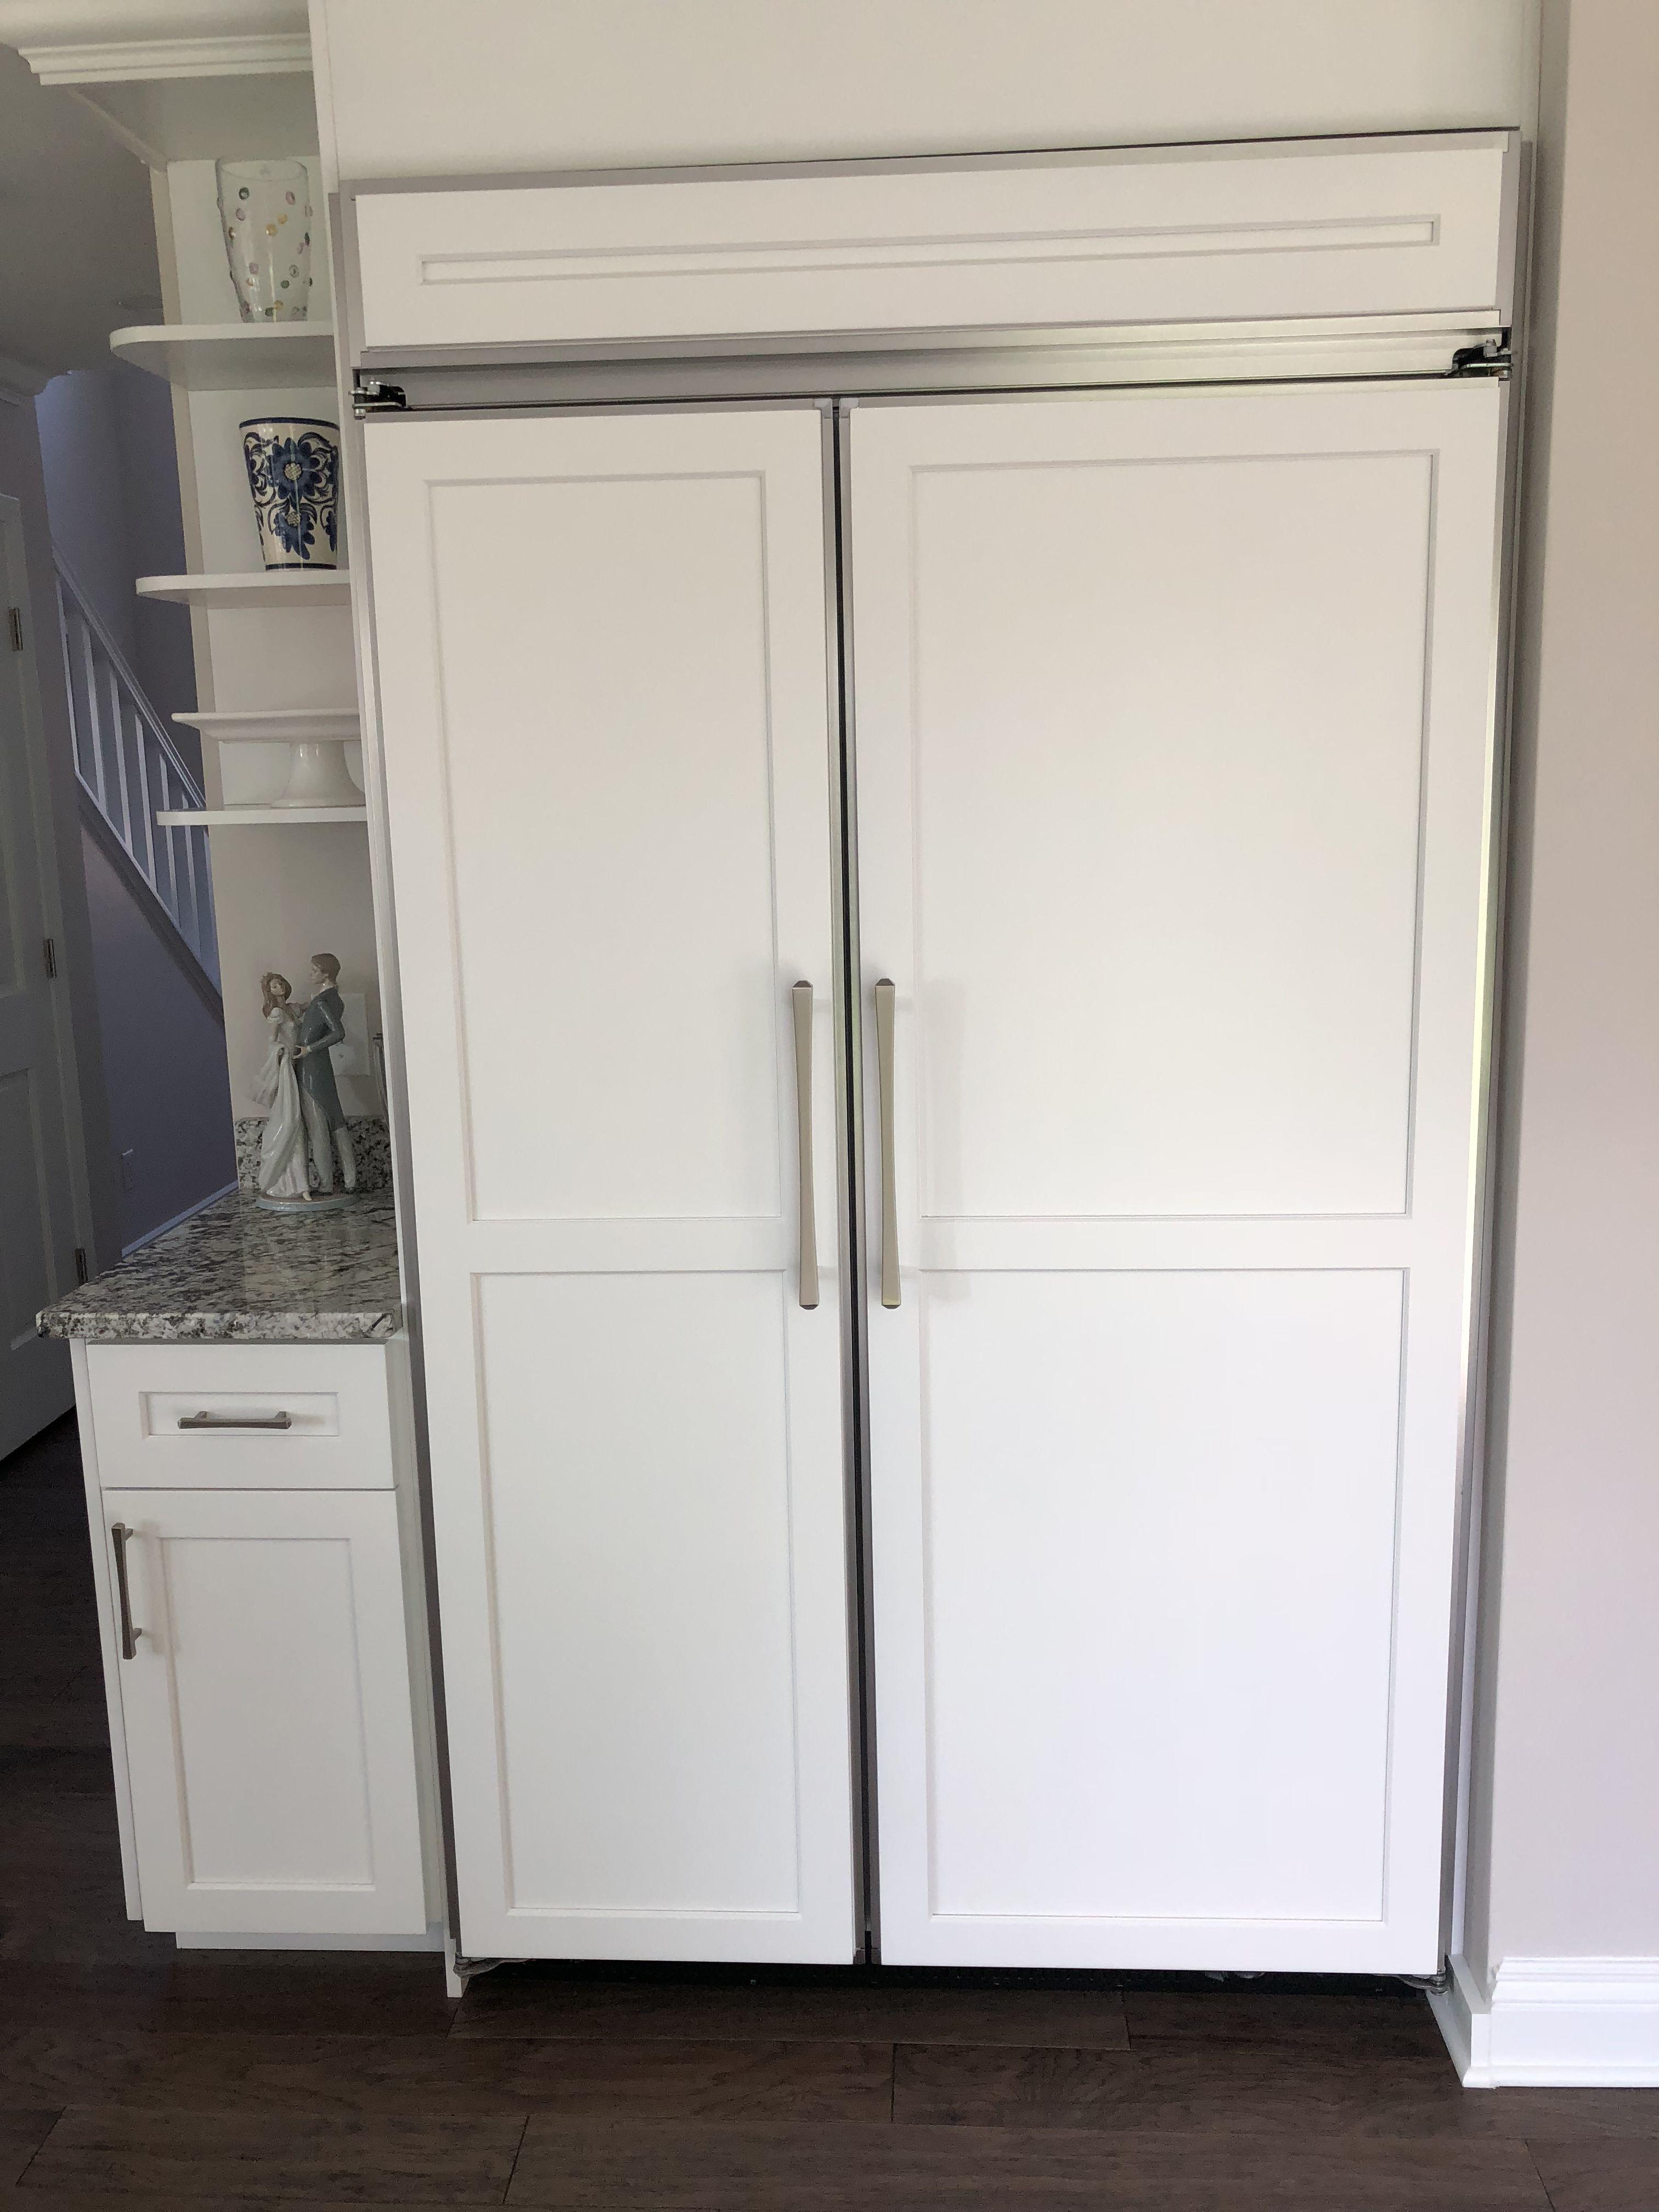 48 u201d kitchen aid refrigerator panel ready custom designed white rh pinterest com